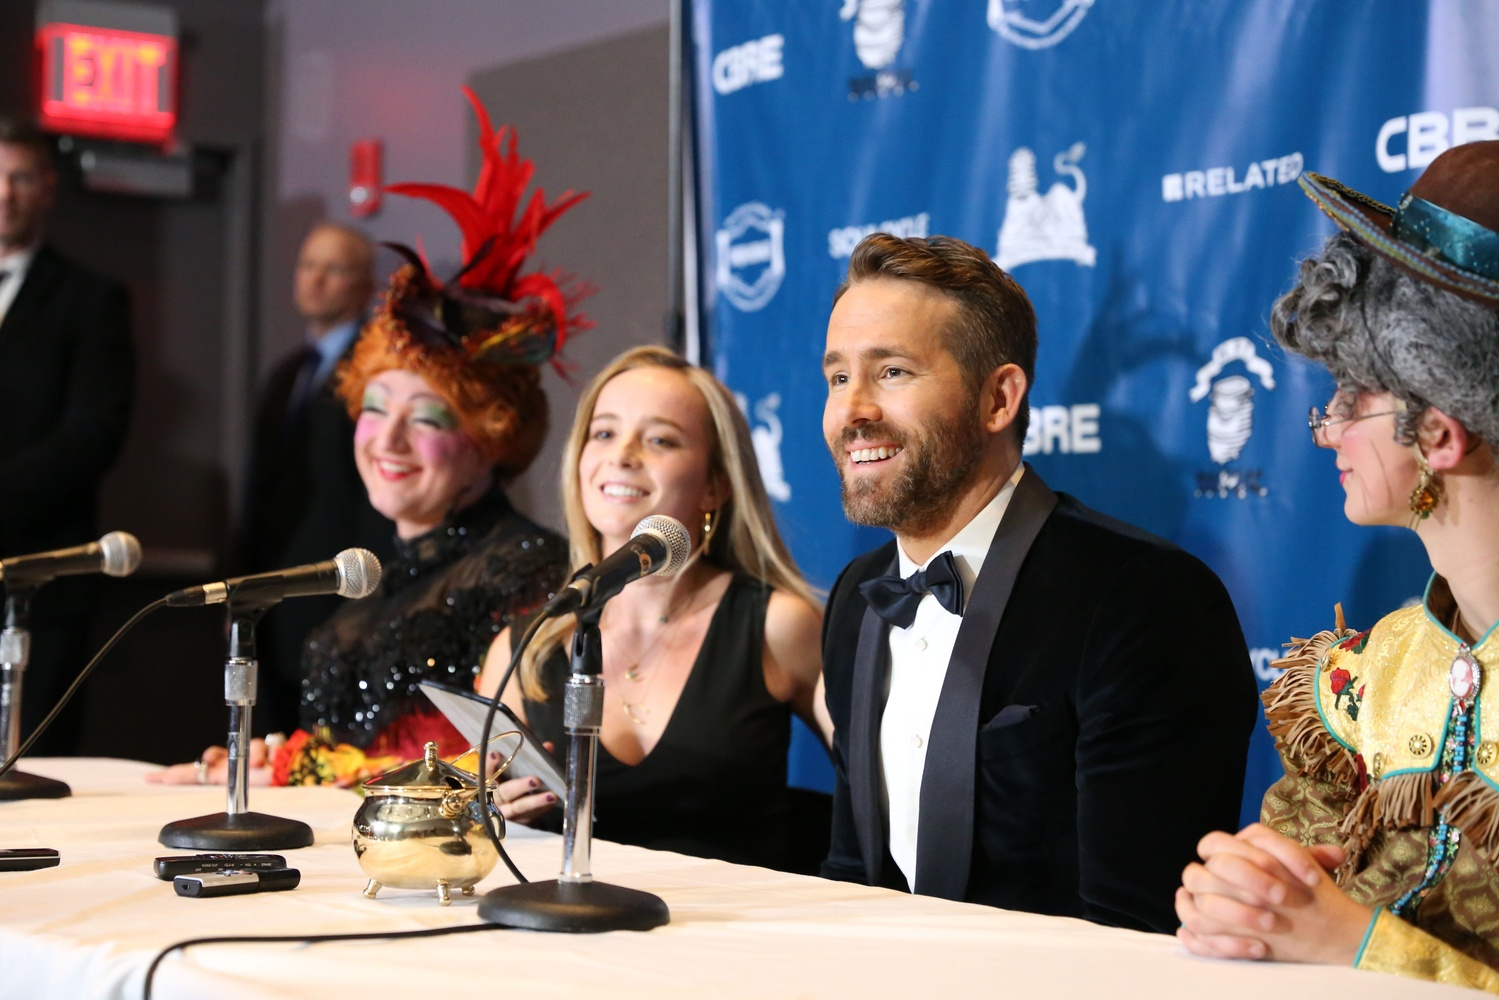 Ryan Reynolds - Man of the Year